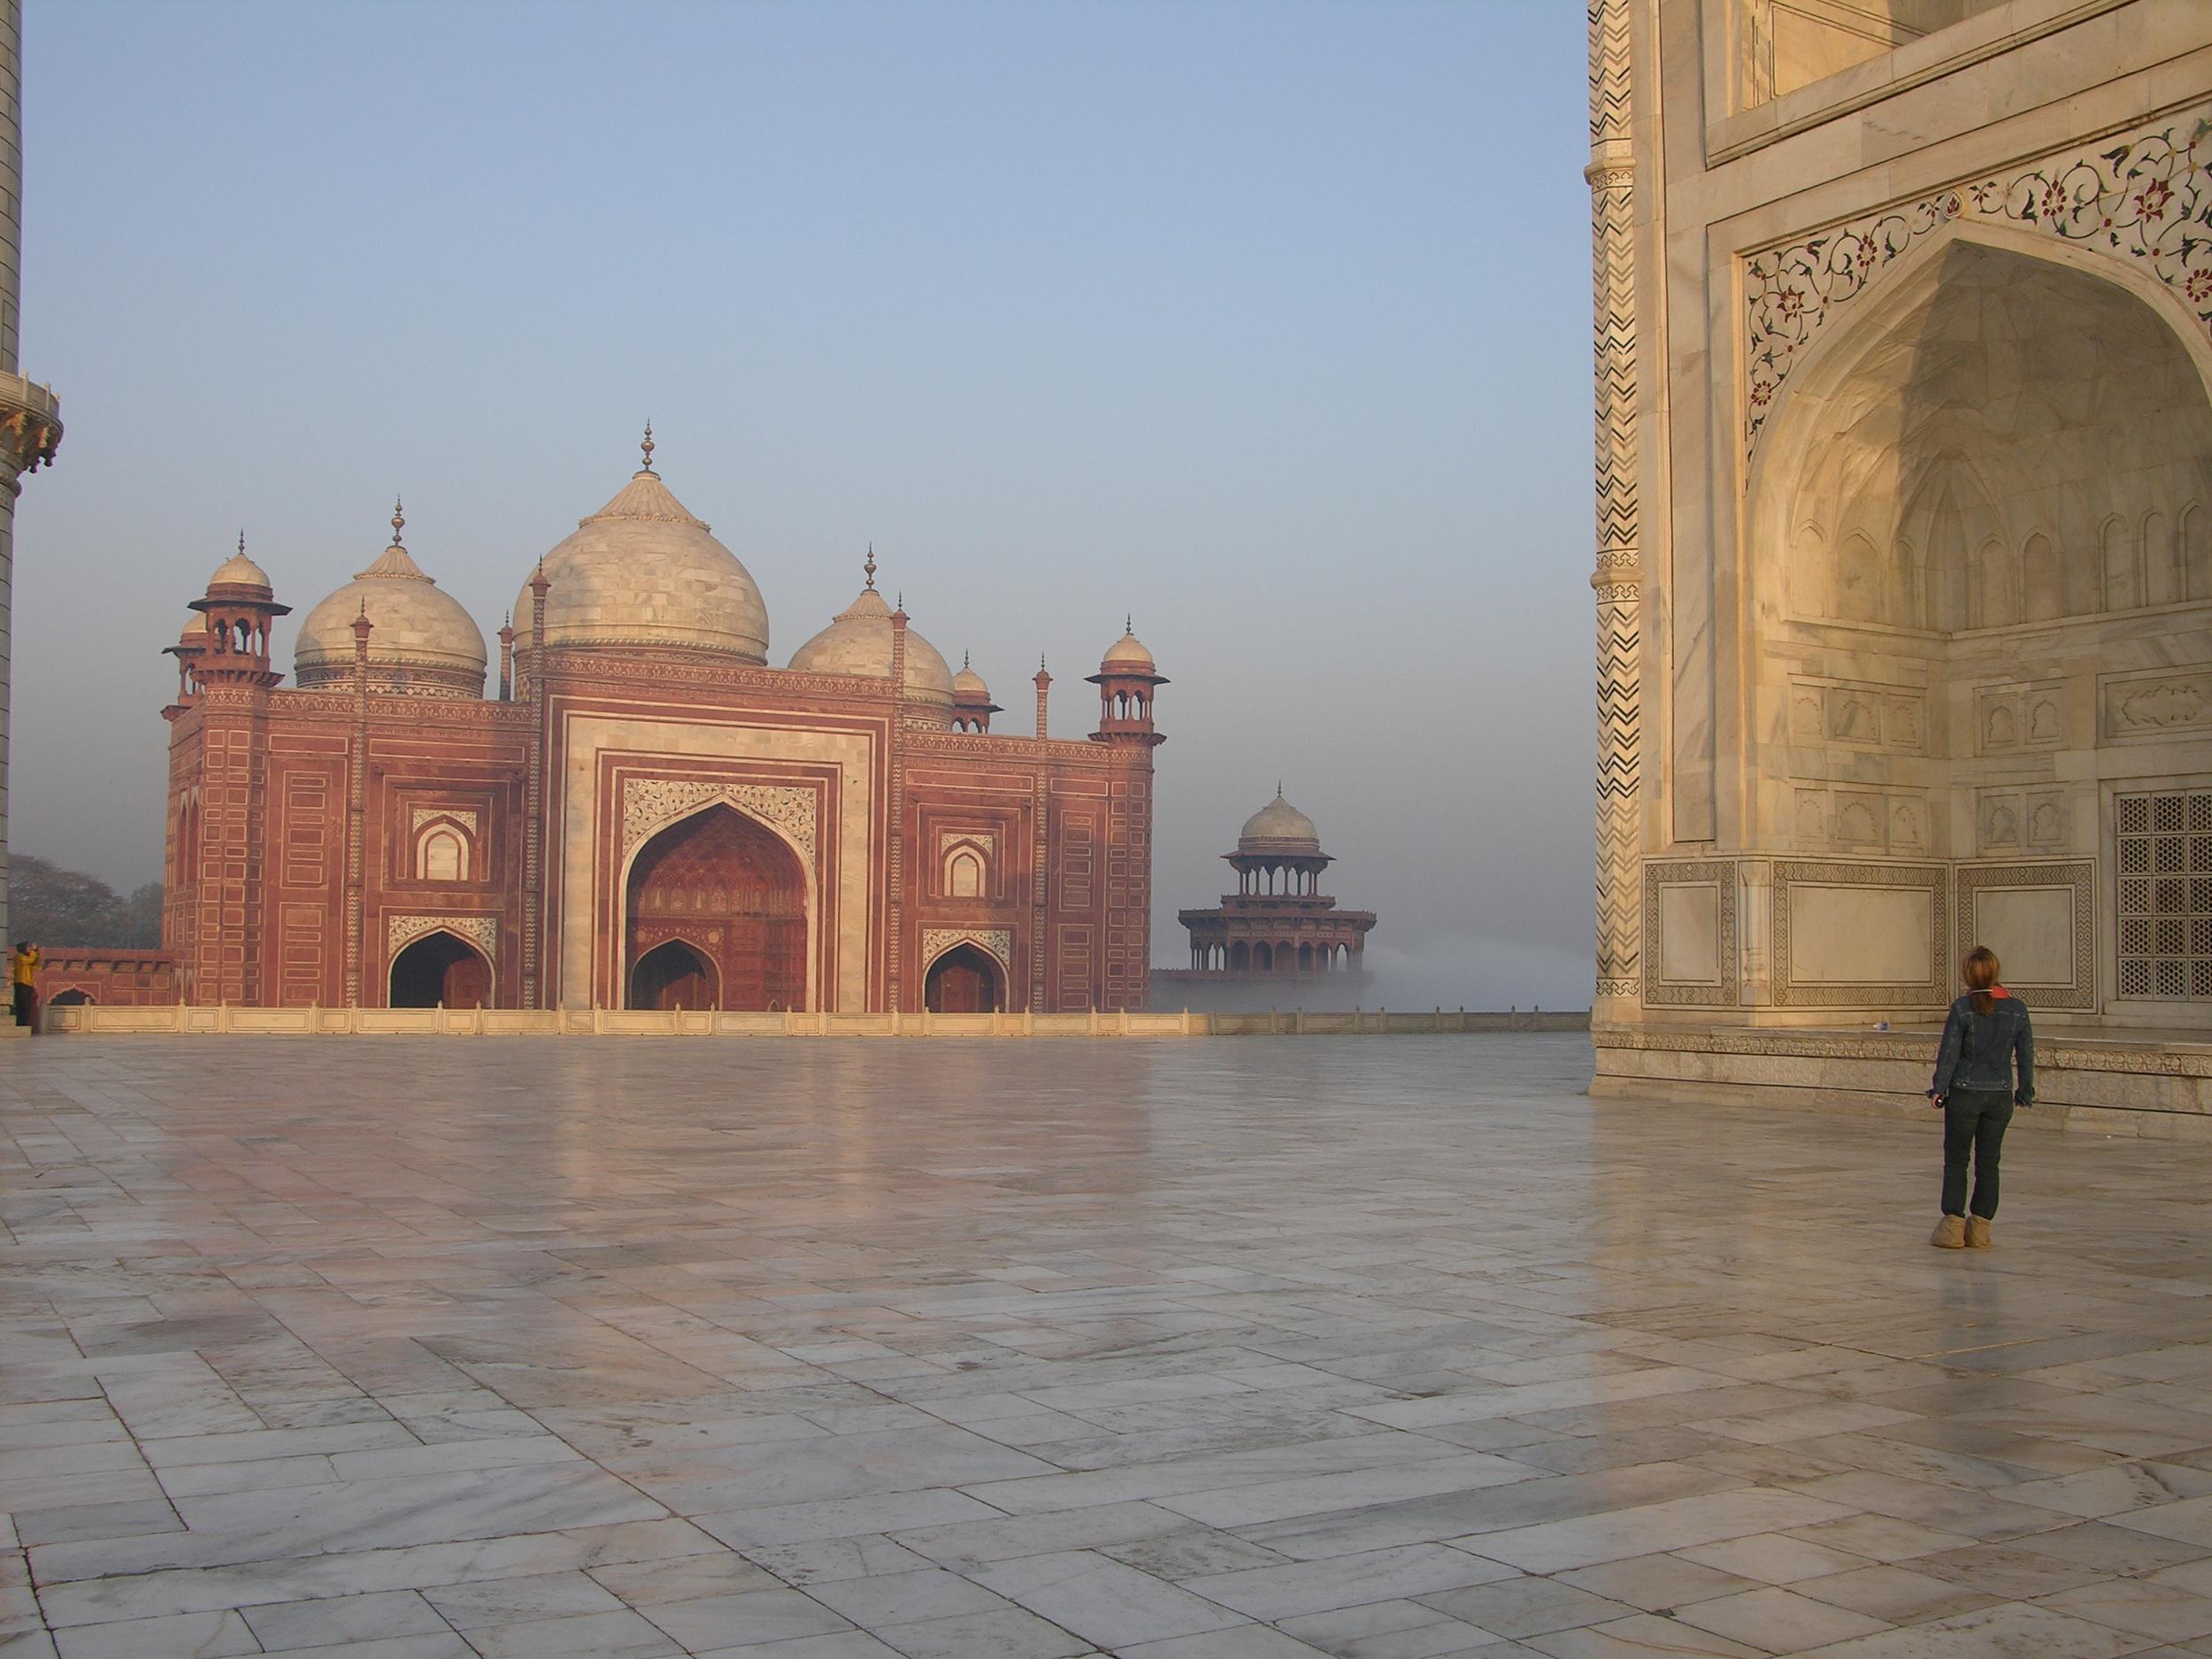 Exploring the Taj Mahal Photo credit: Sanjay Chatterji